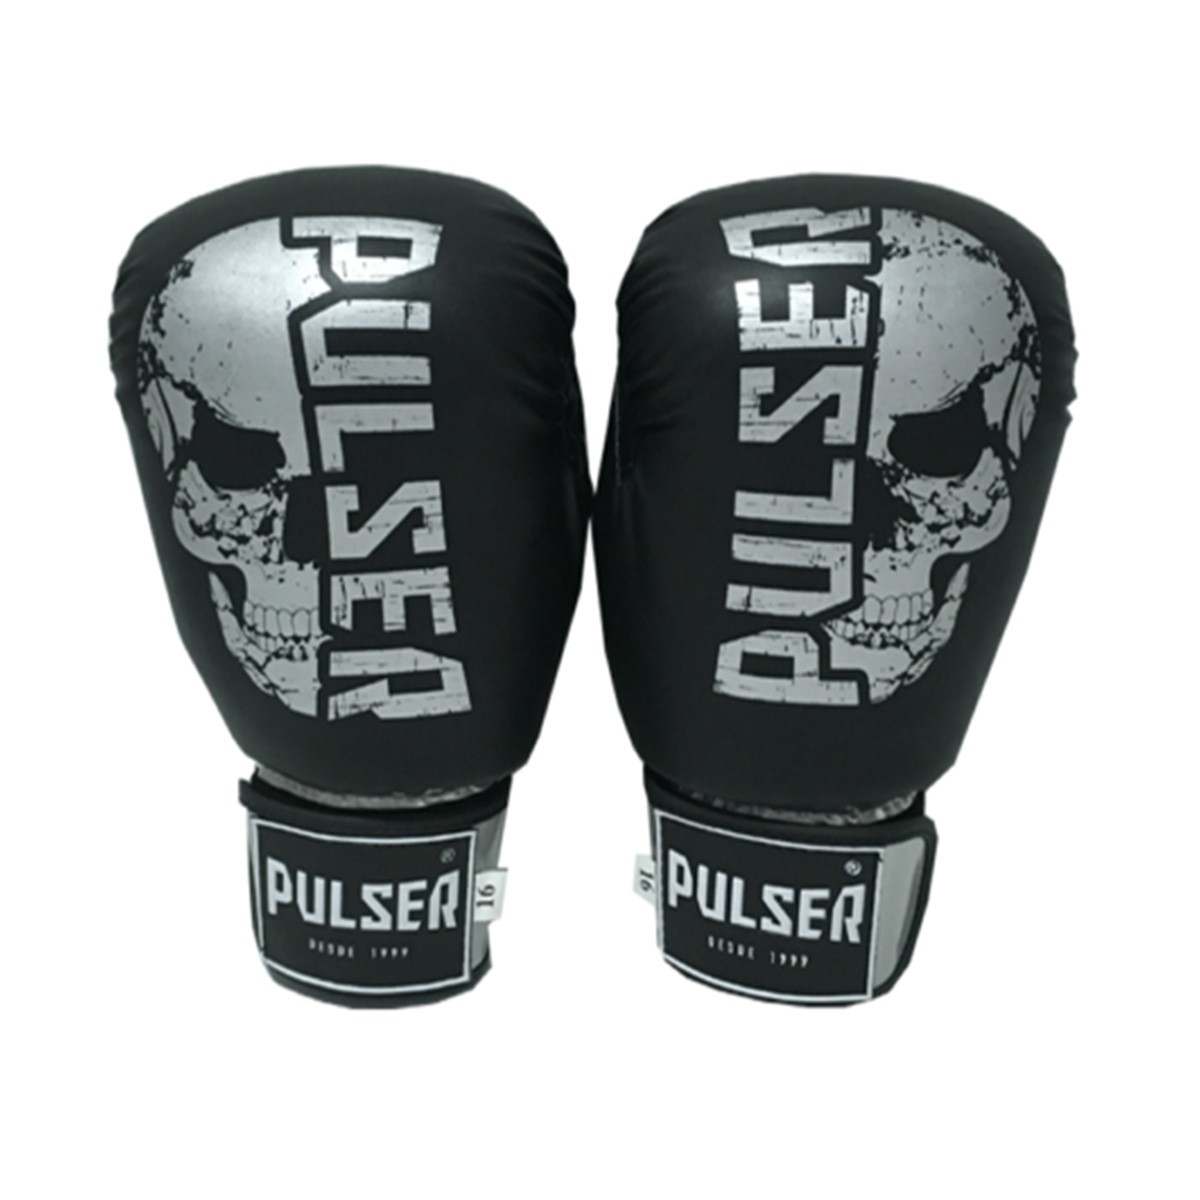 Luva de Boxe / Muay Thai 14oz - Caveira Preto - Pulser  - PRALUTA SHOP